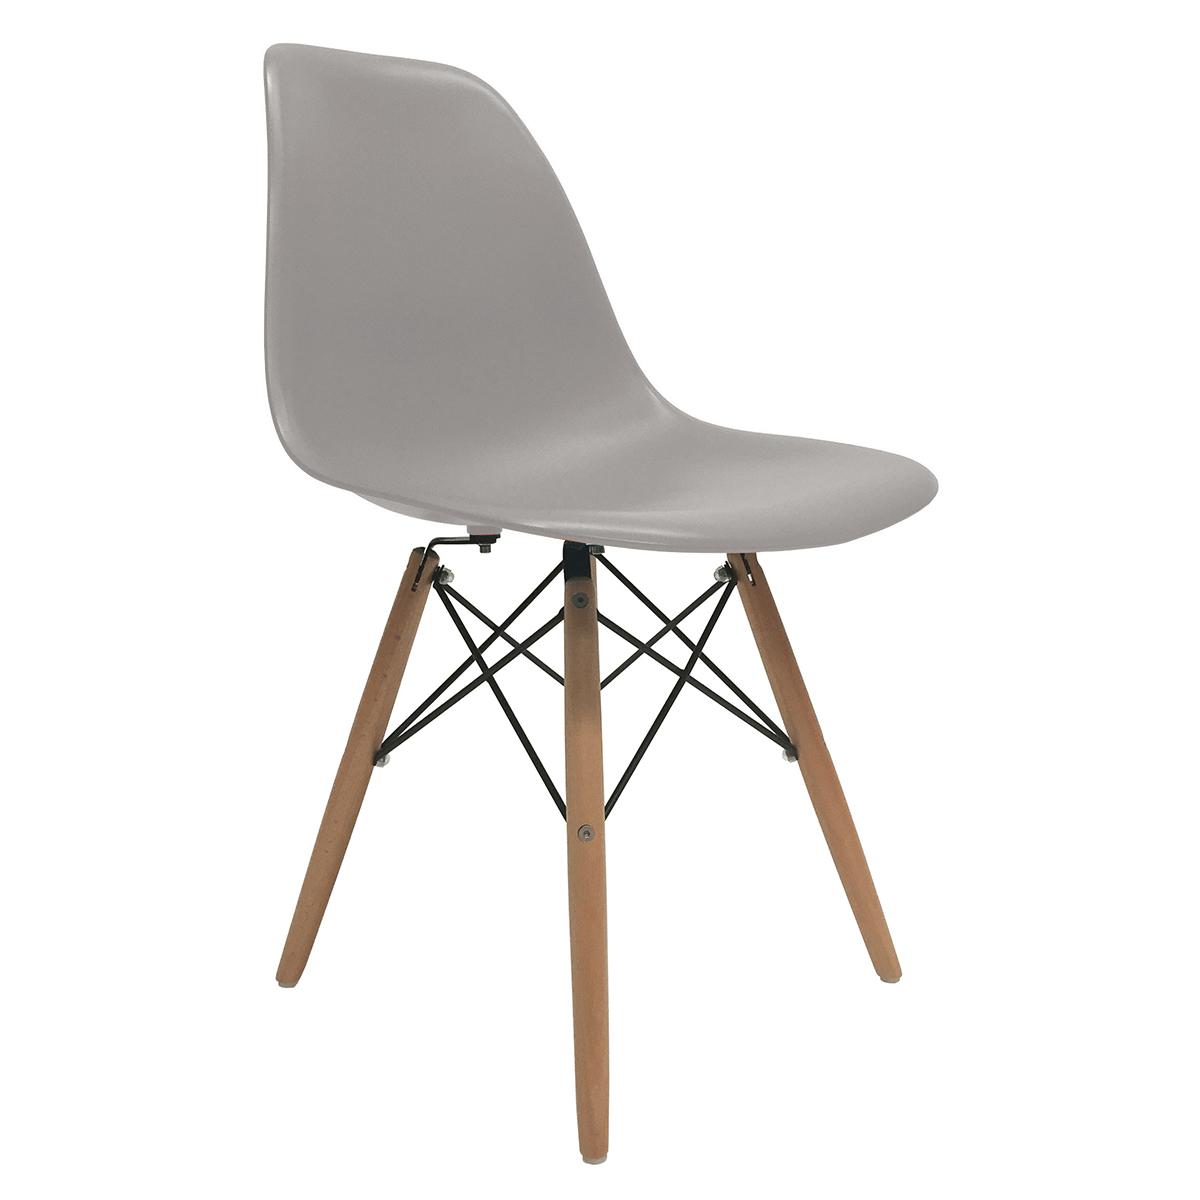 eames molded wood side chair baby high ikea set of 2 dsw dining eiffel dowel leg